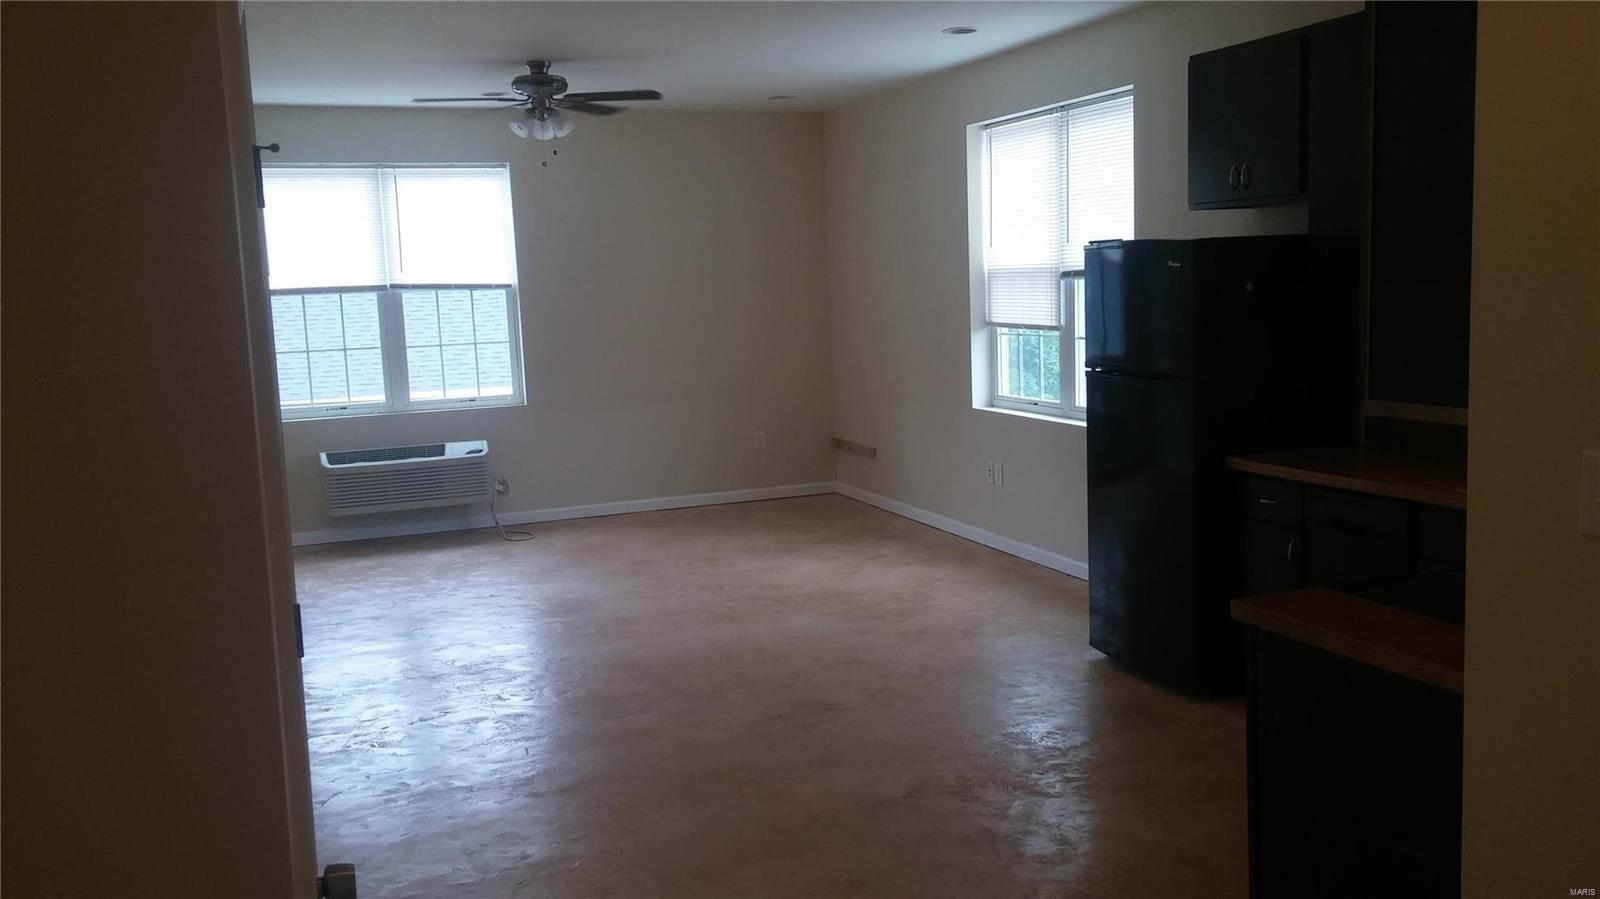 419 S FLORISSANT Road Property Photo - Ferguson, MO real estate listing